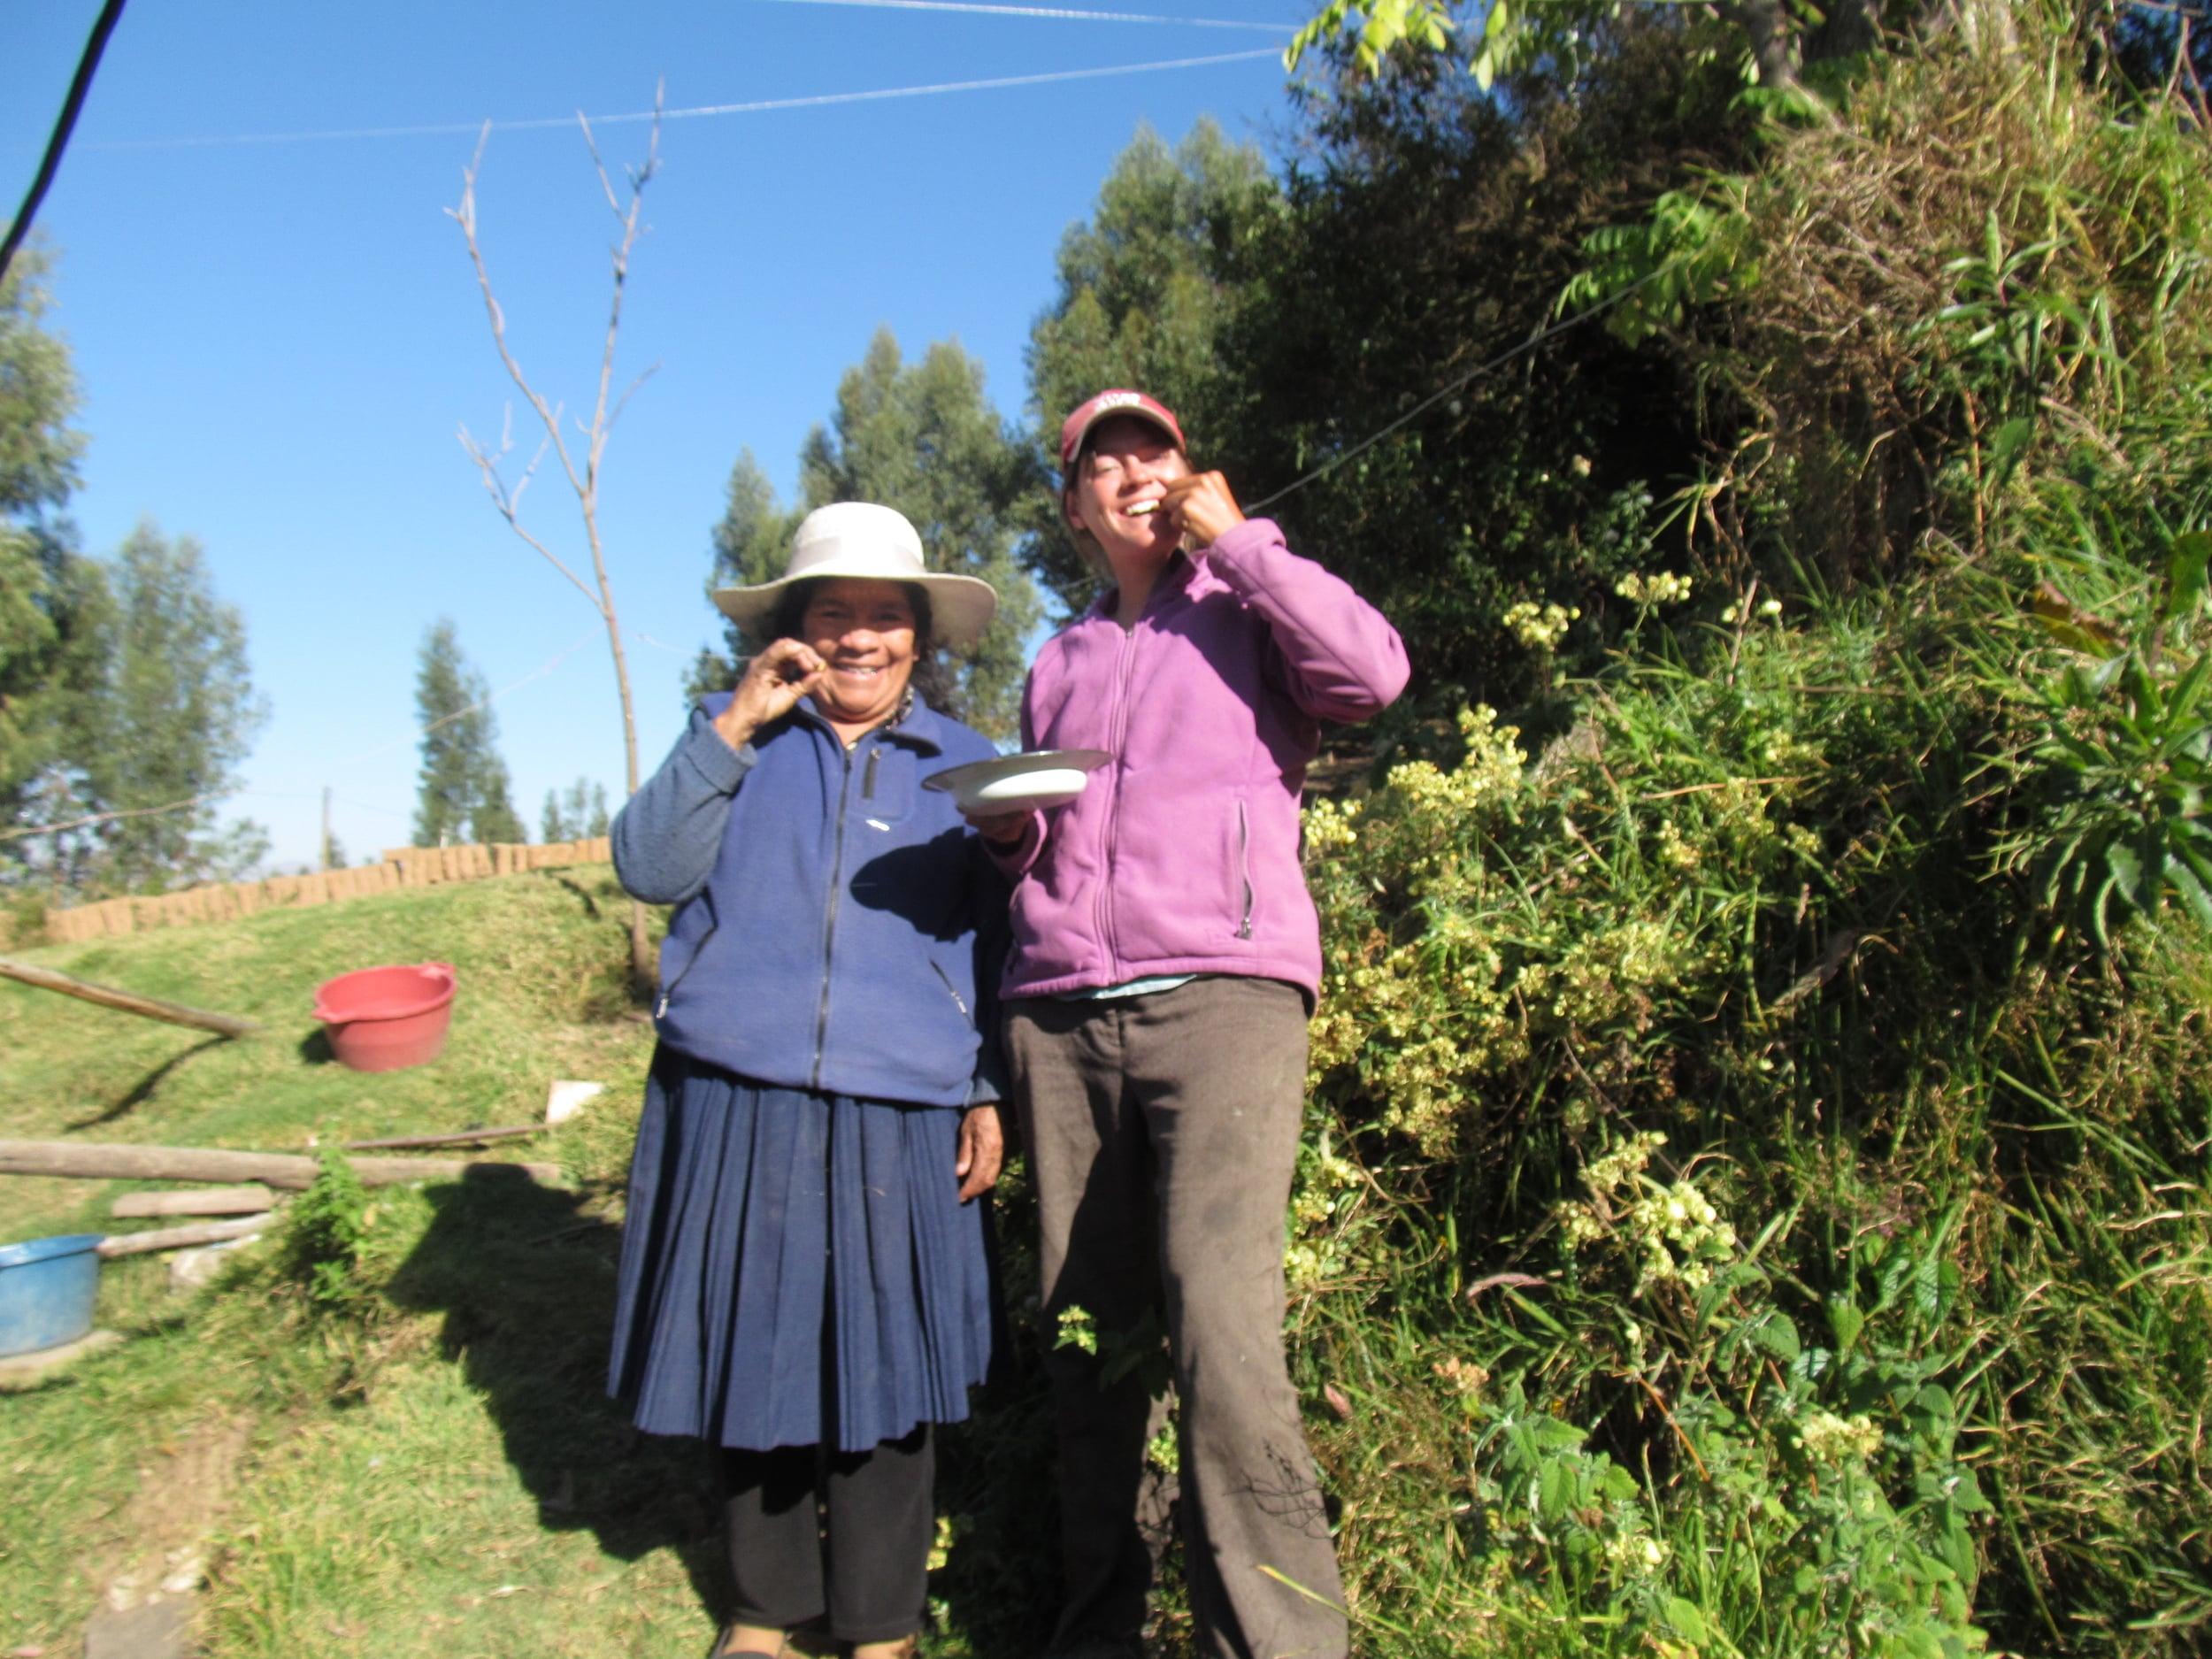 Margarita and I enjoying cancha. We have more photos of us enjoying cancha but I think you get the point.